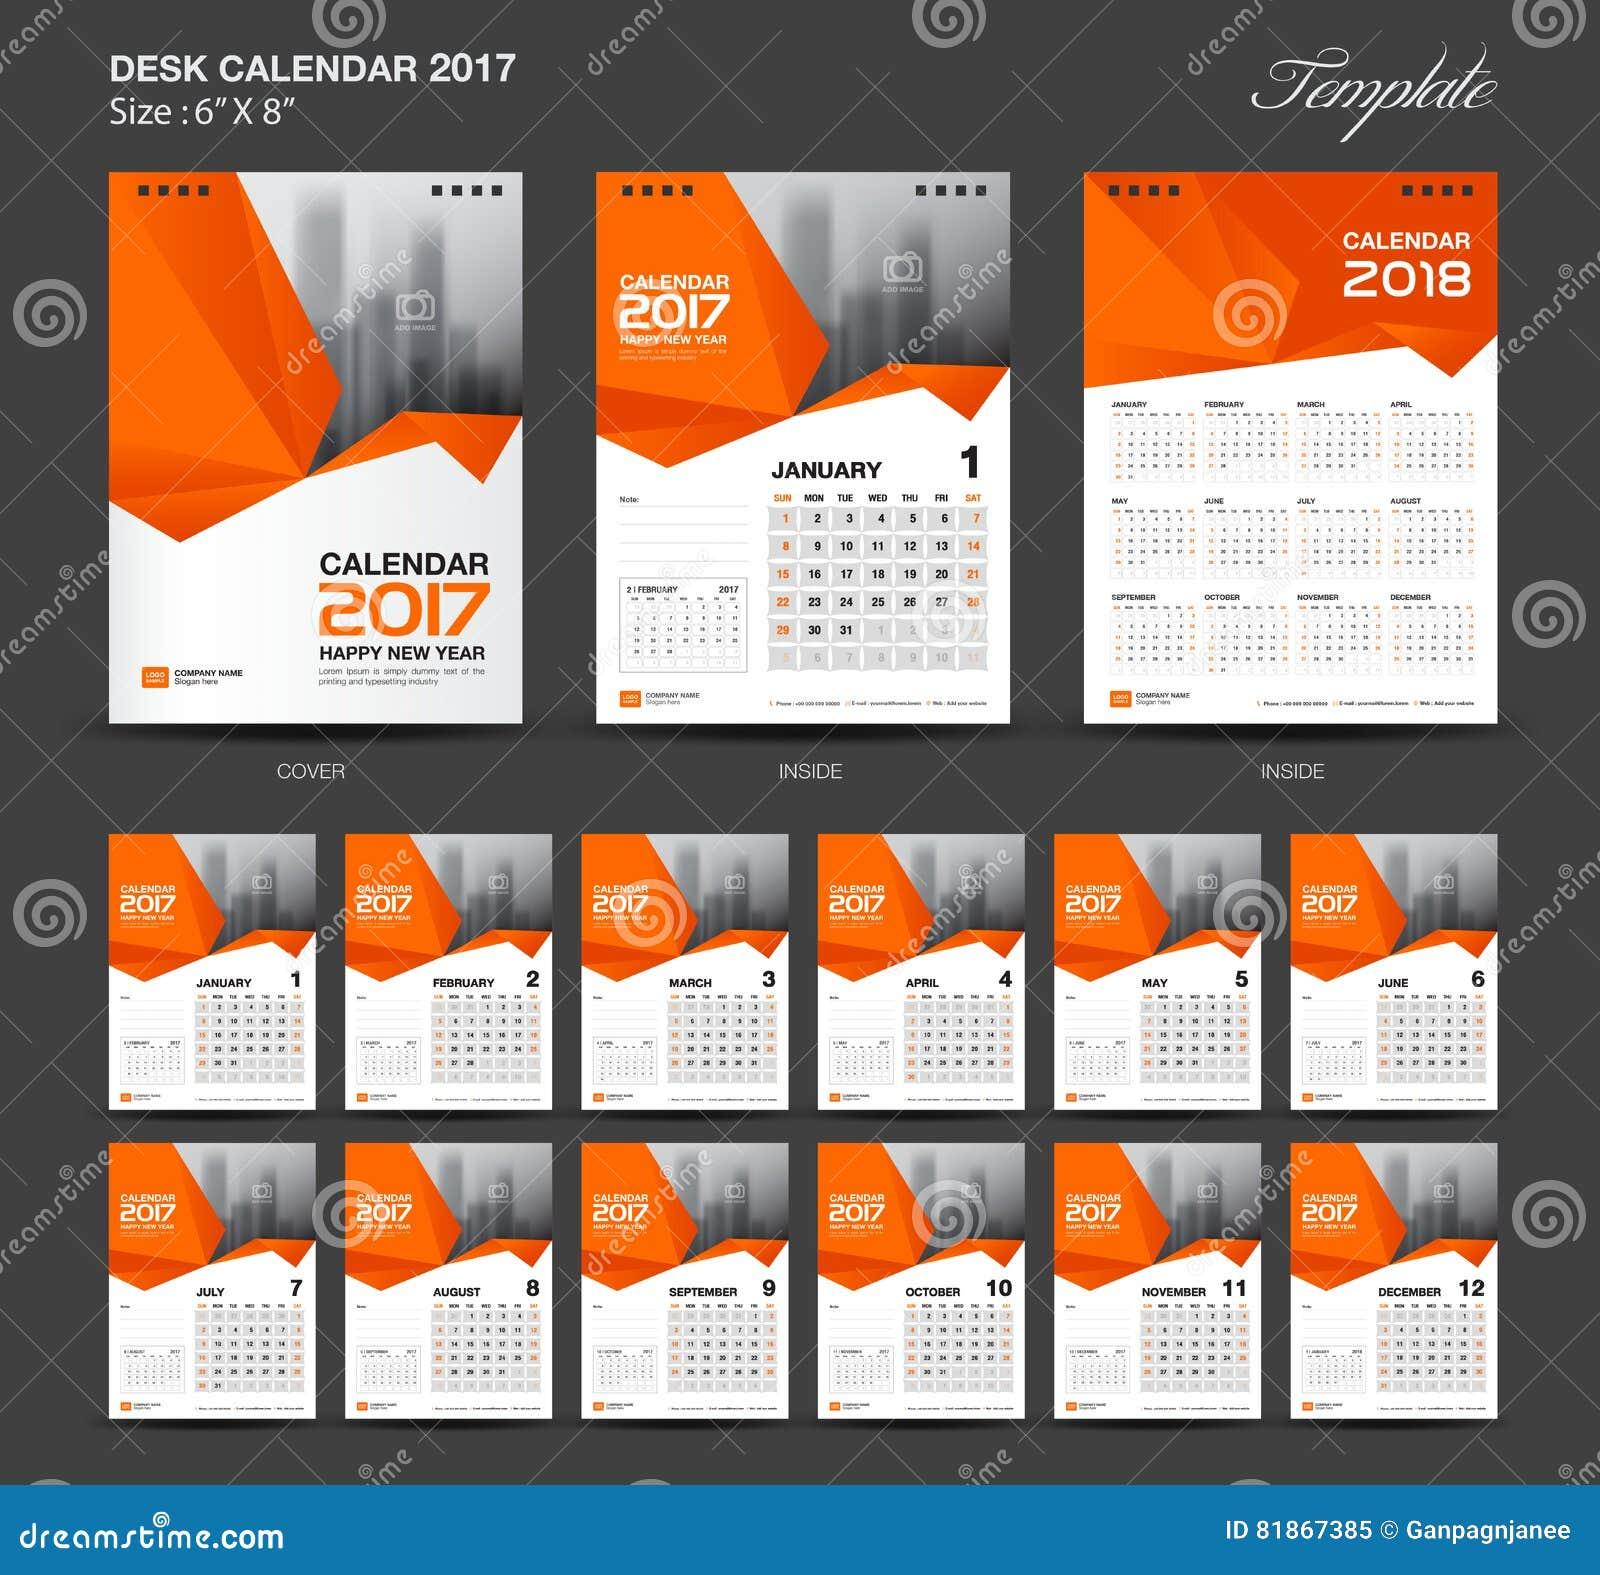 Calendar Design Size : Desk calendar vector design template set of